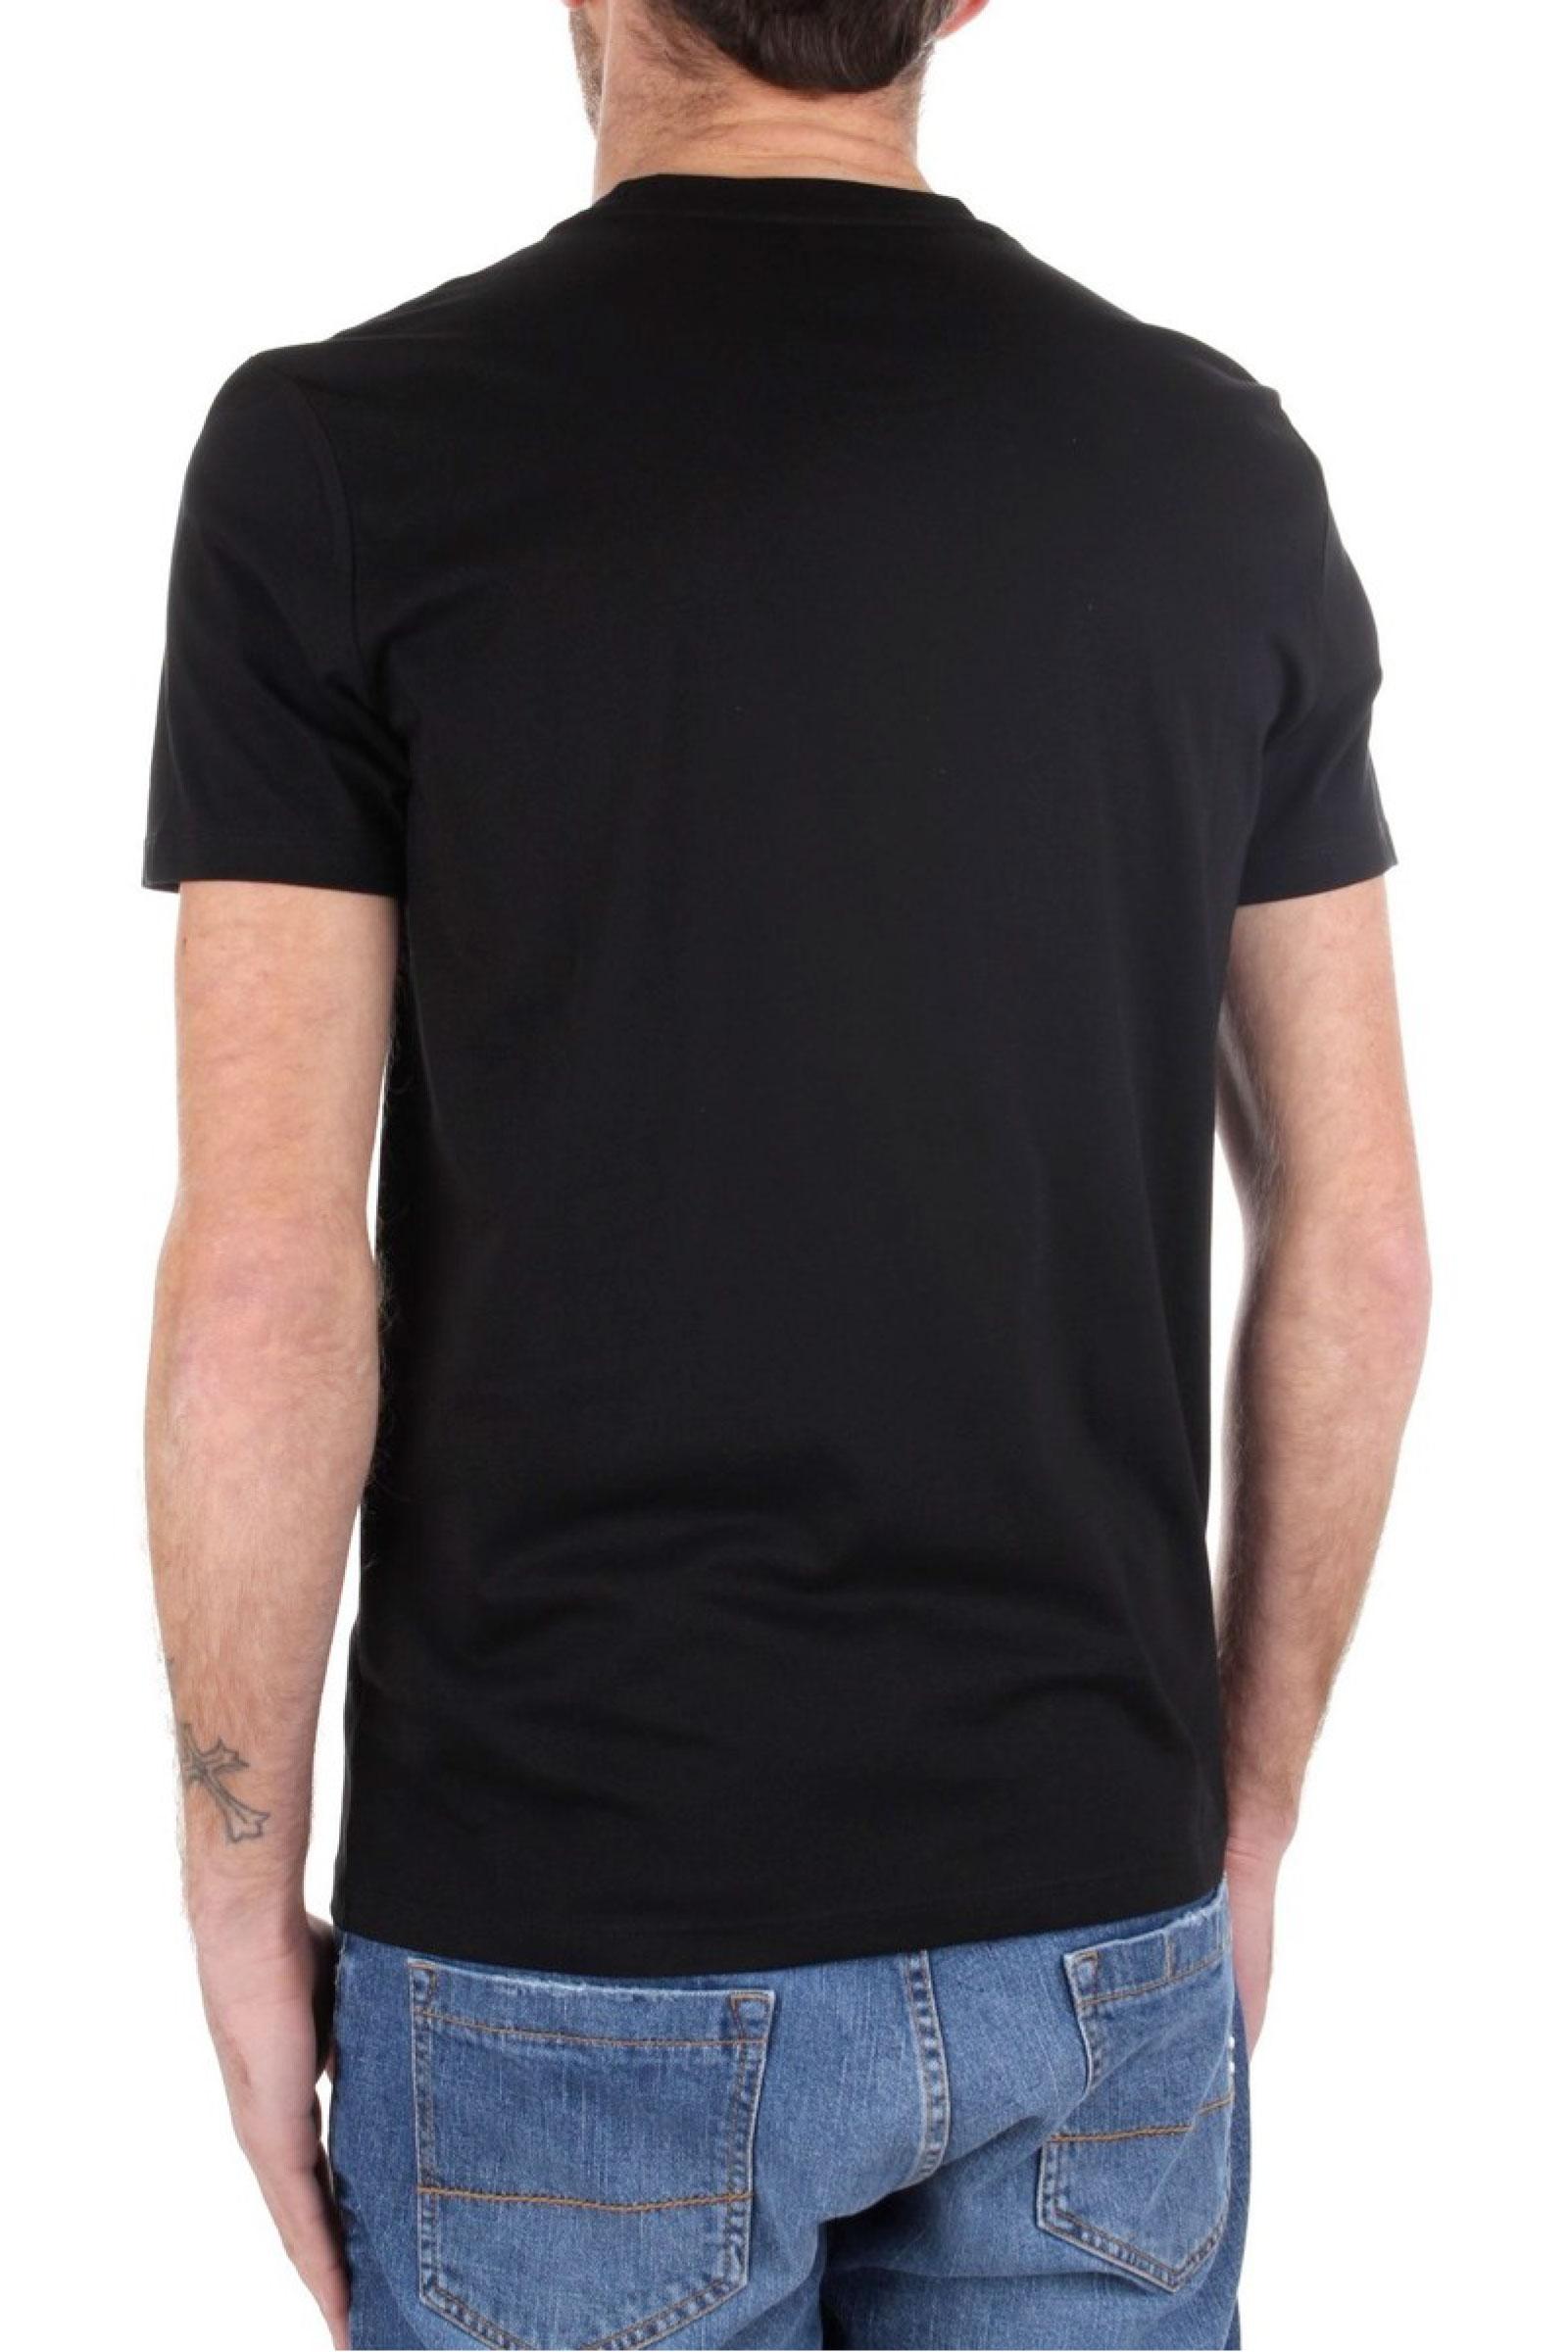 BLAUER T-Shirt Uomo BLAUER | T-Shirt | 21SBLUH02134999